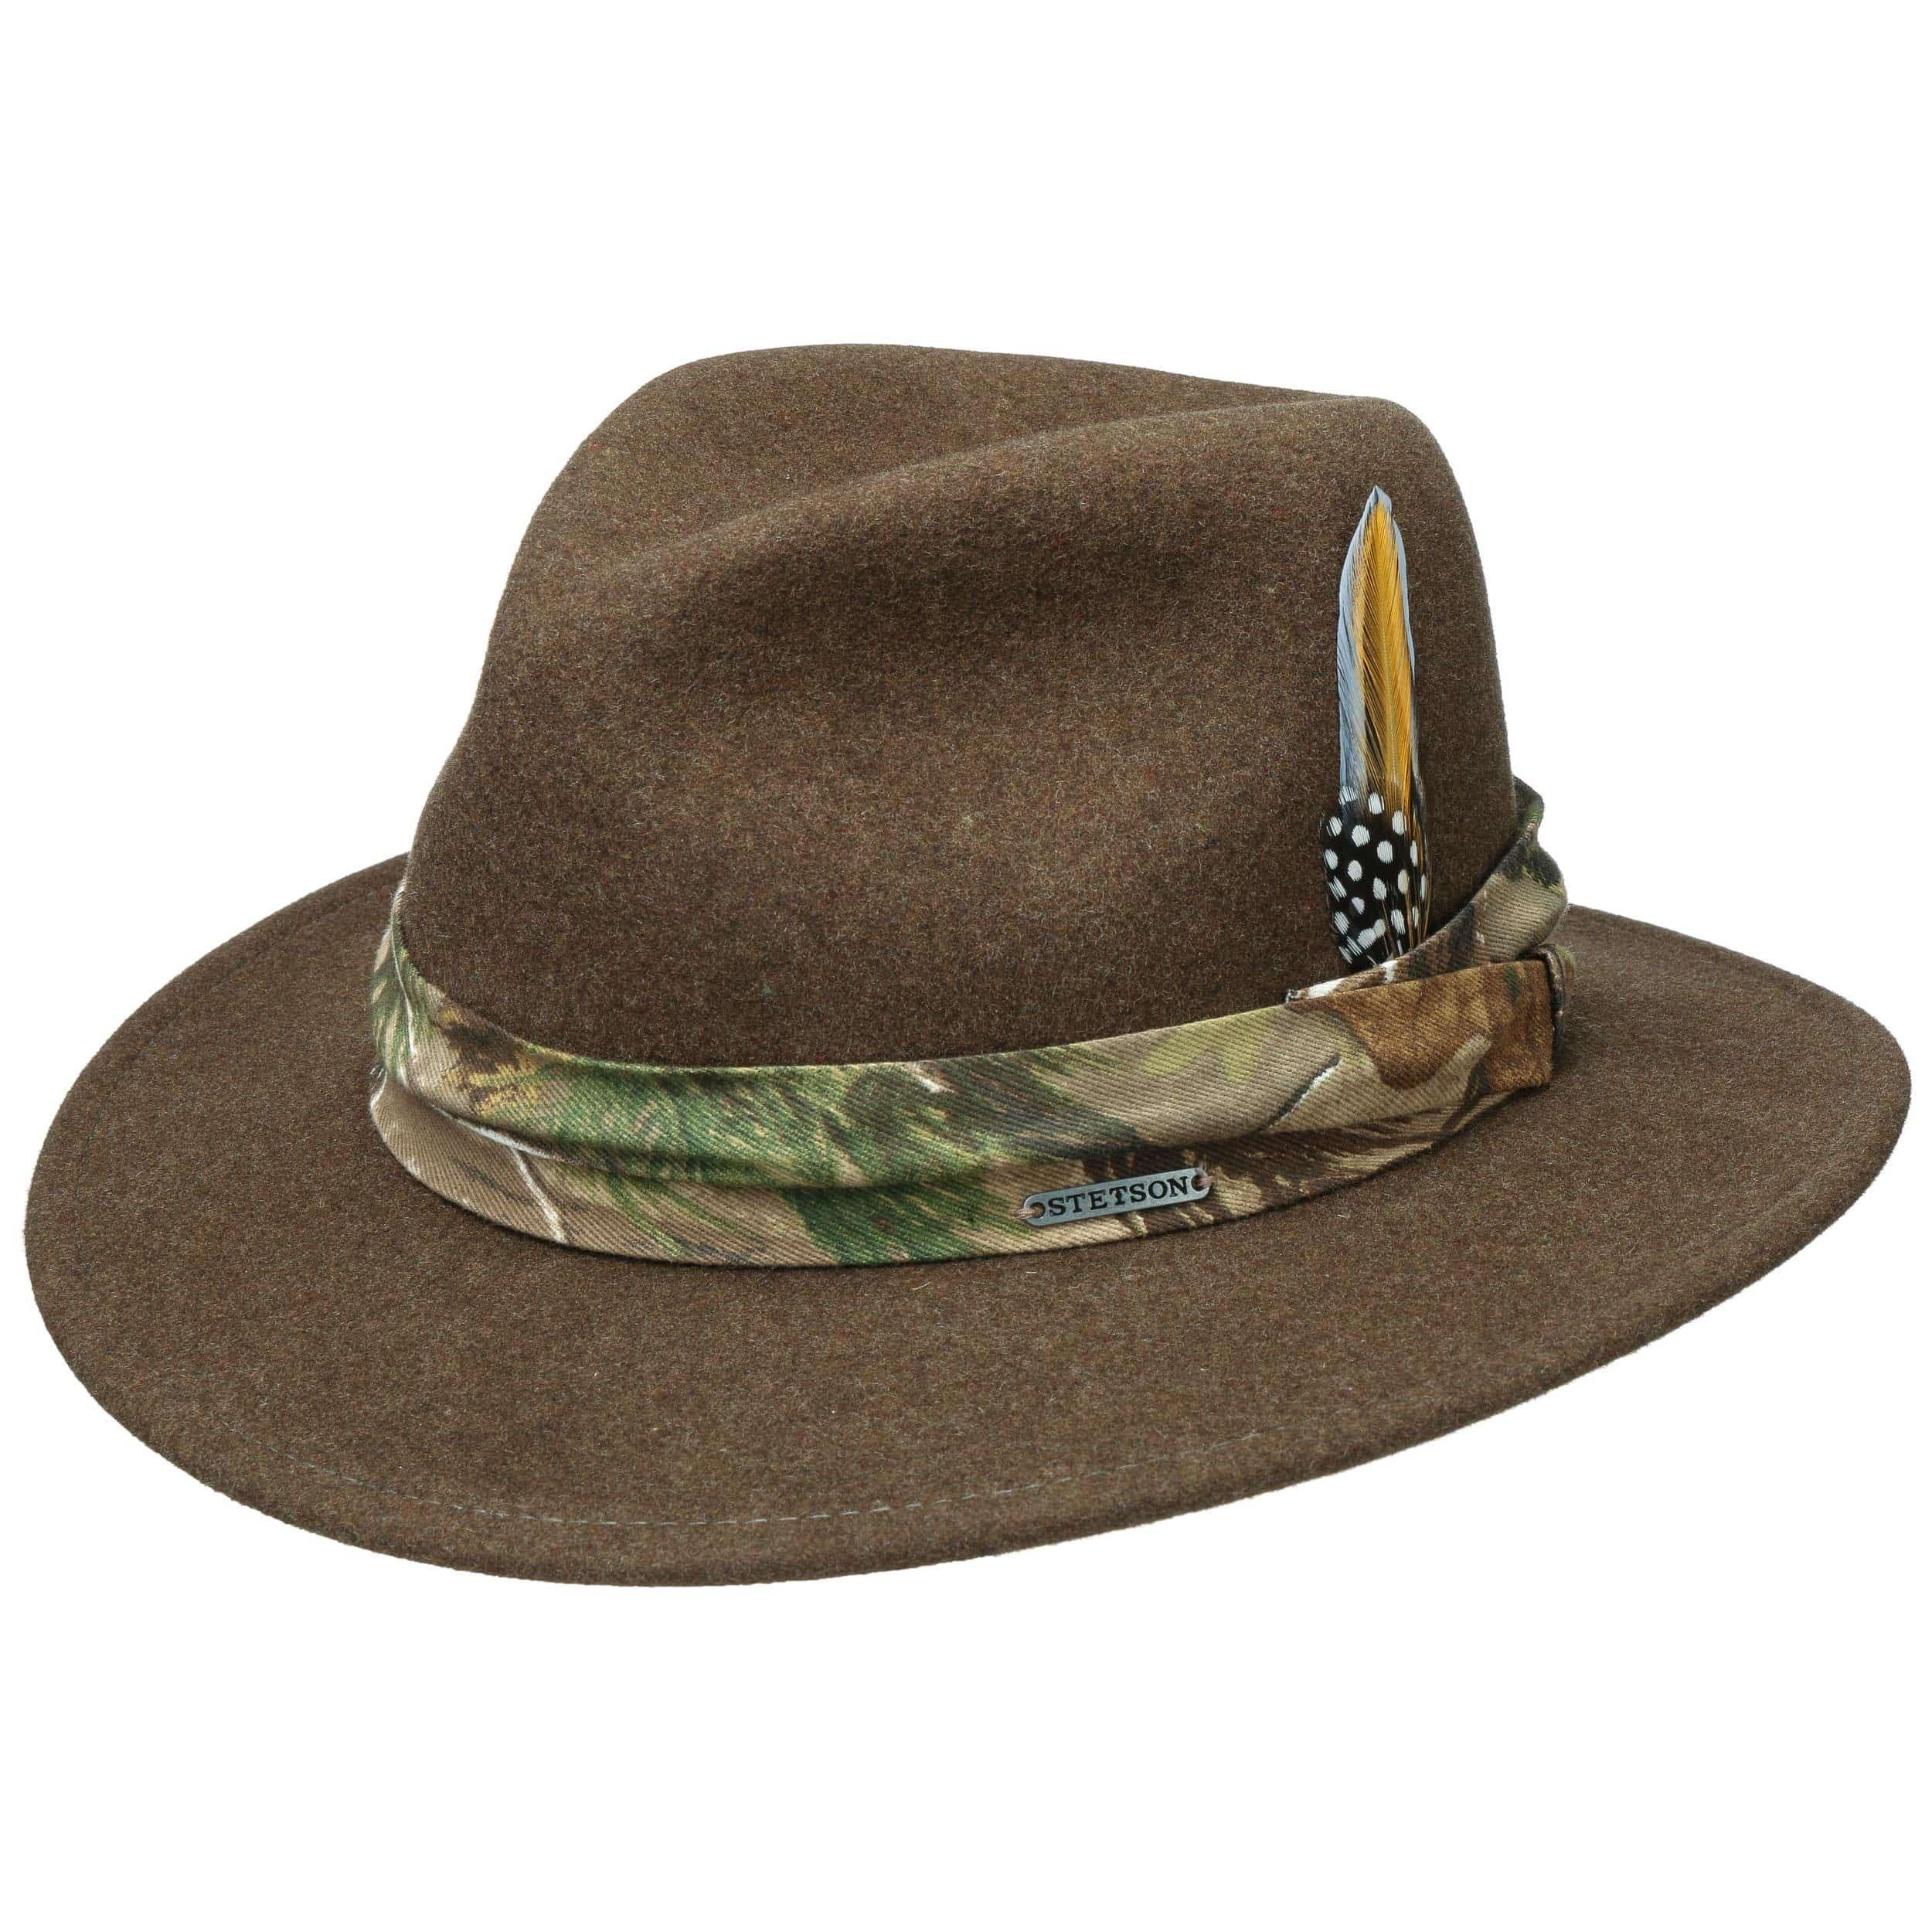 Newark VitaFelt Wool Hat brown